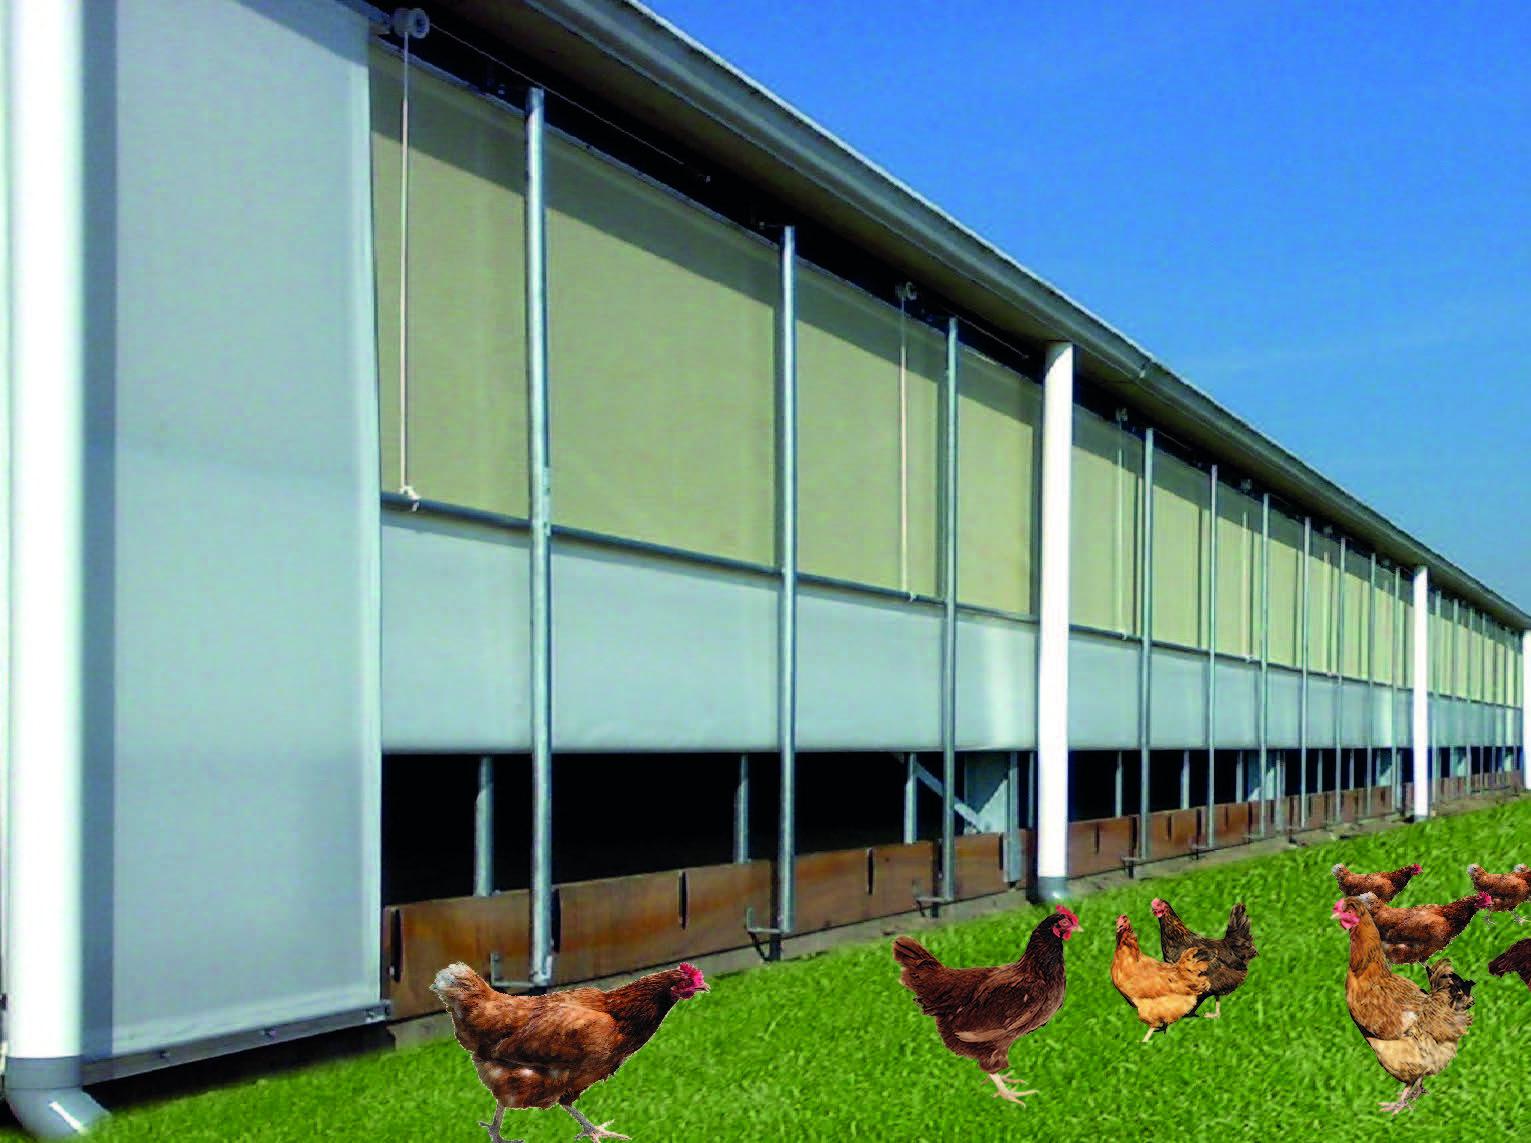 Vervaeke Systeme Port Poulet, Prodirect-Agriculture